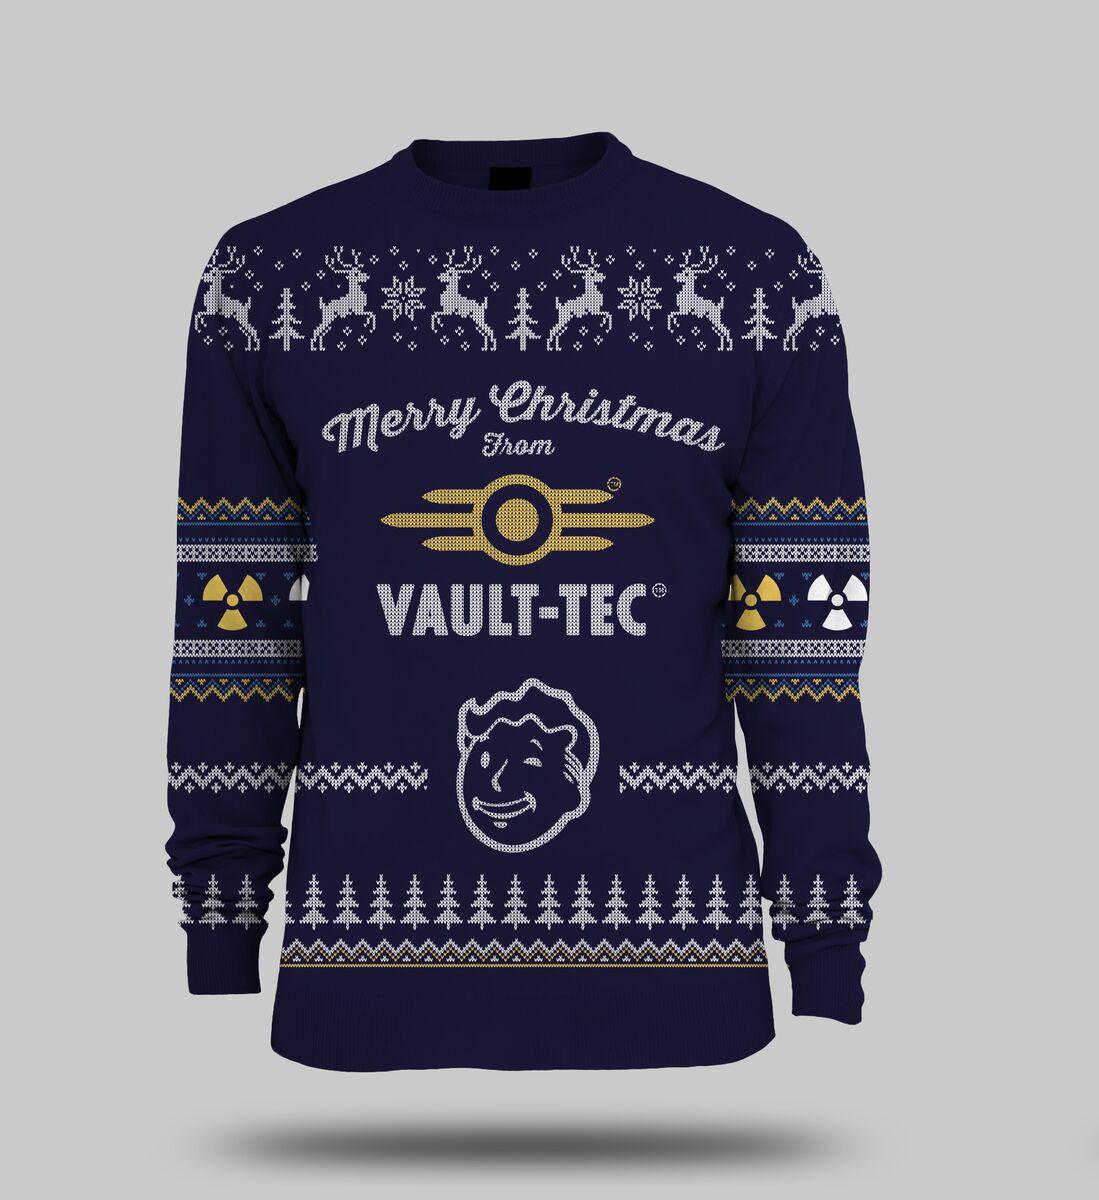 Fallout Christmas Jumper